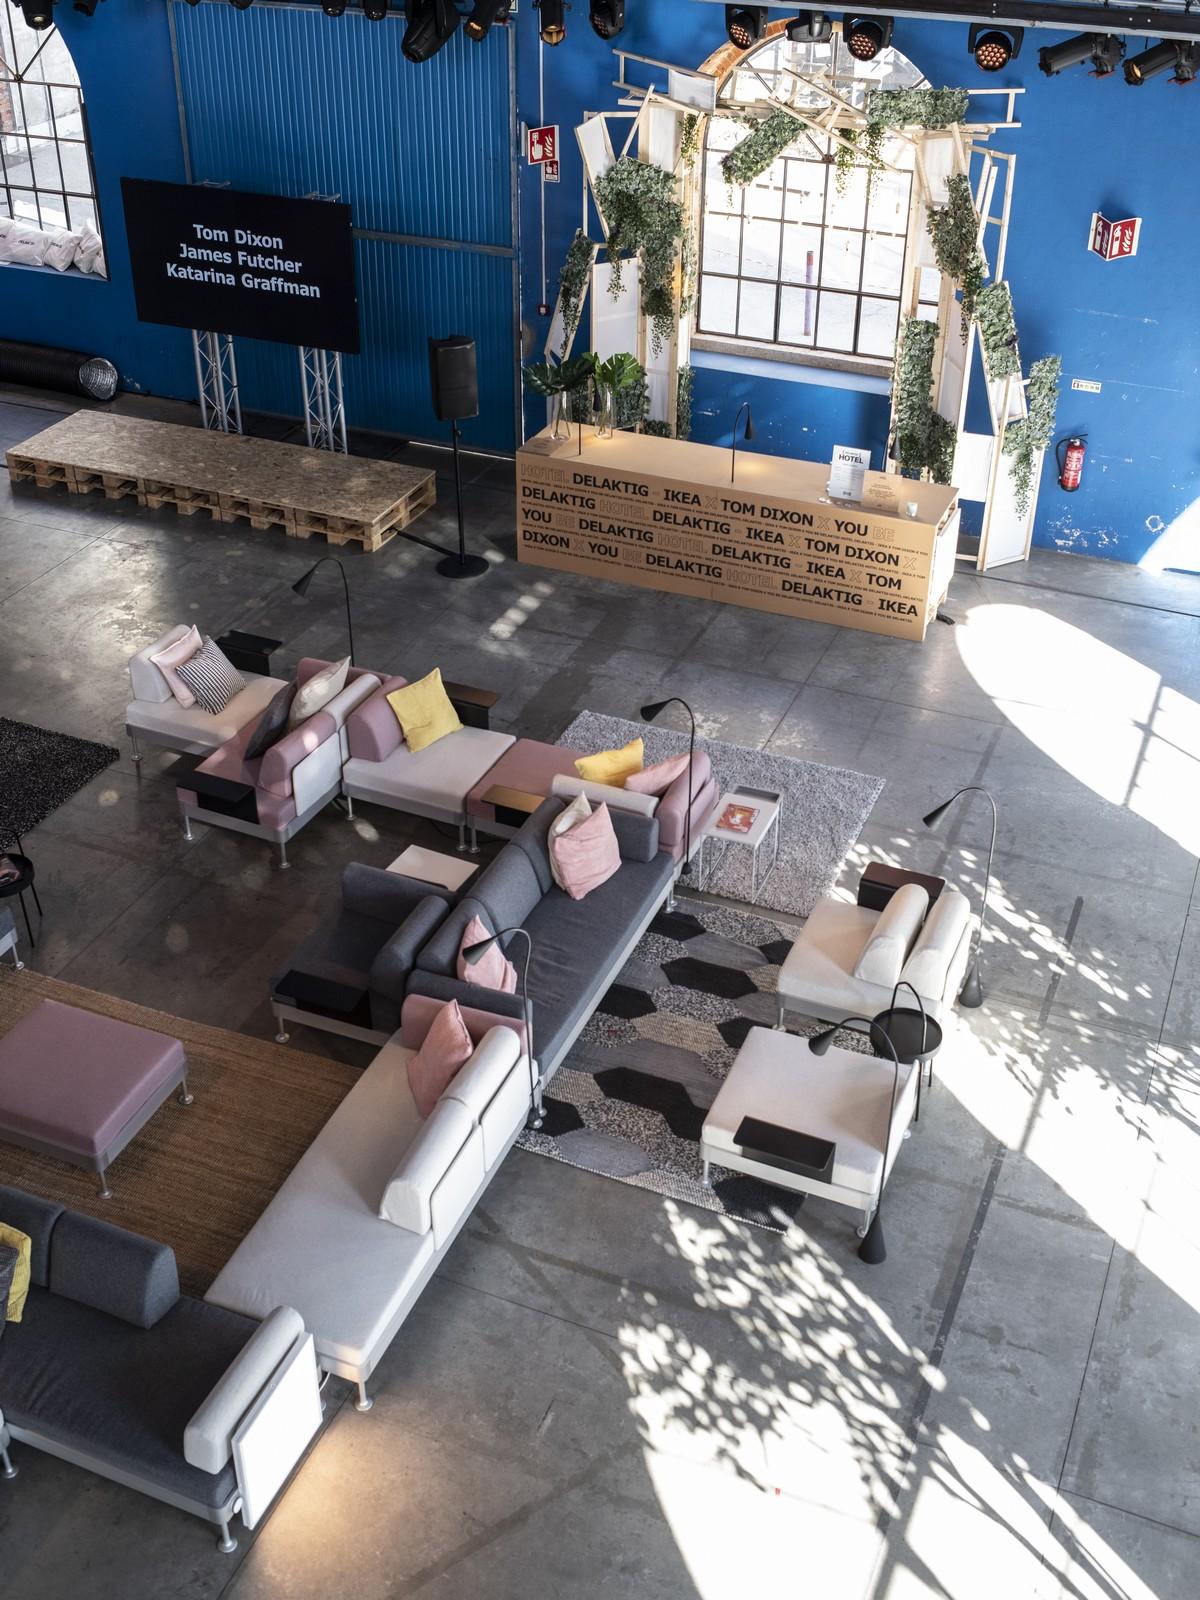 Ikea Tom Dixon 2019